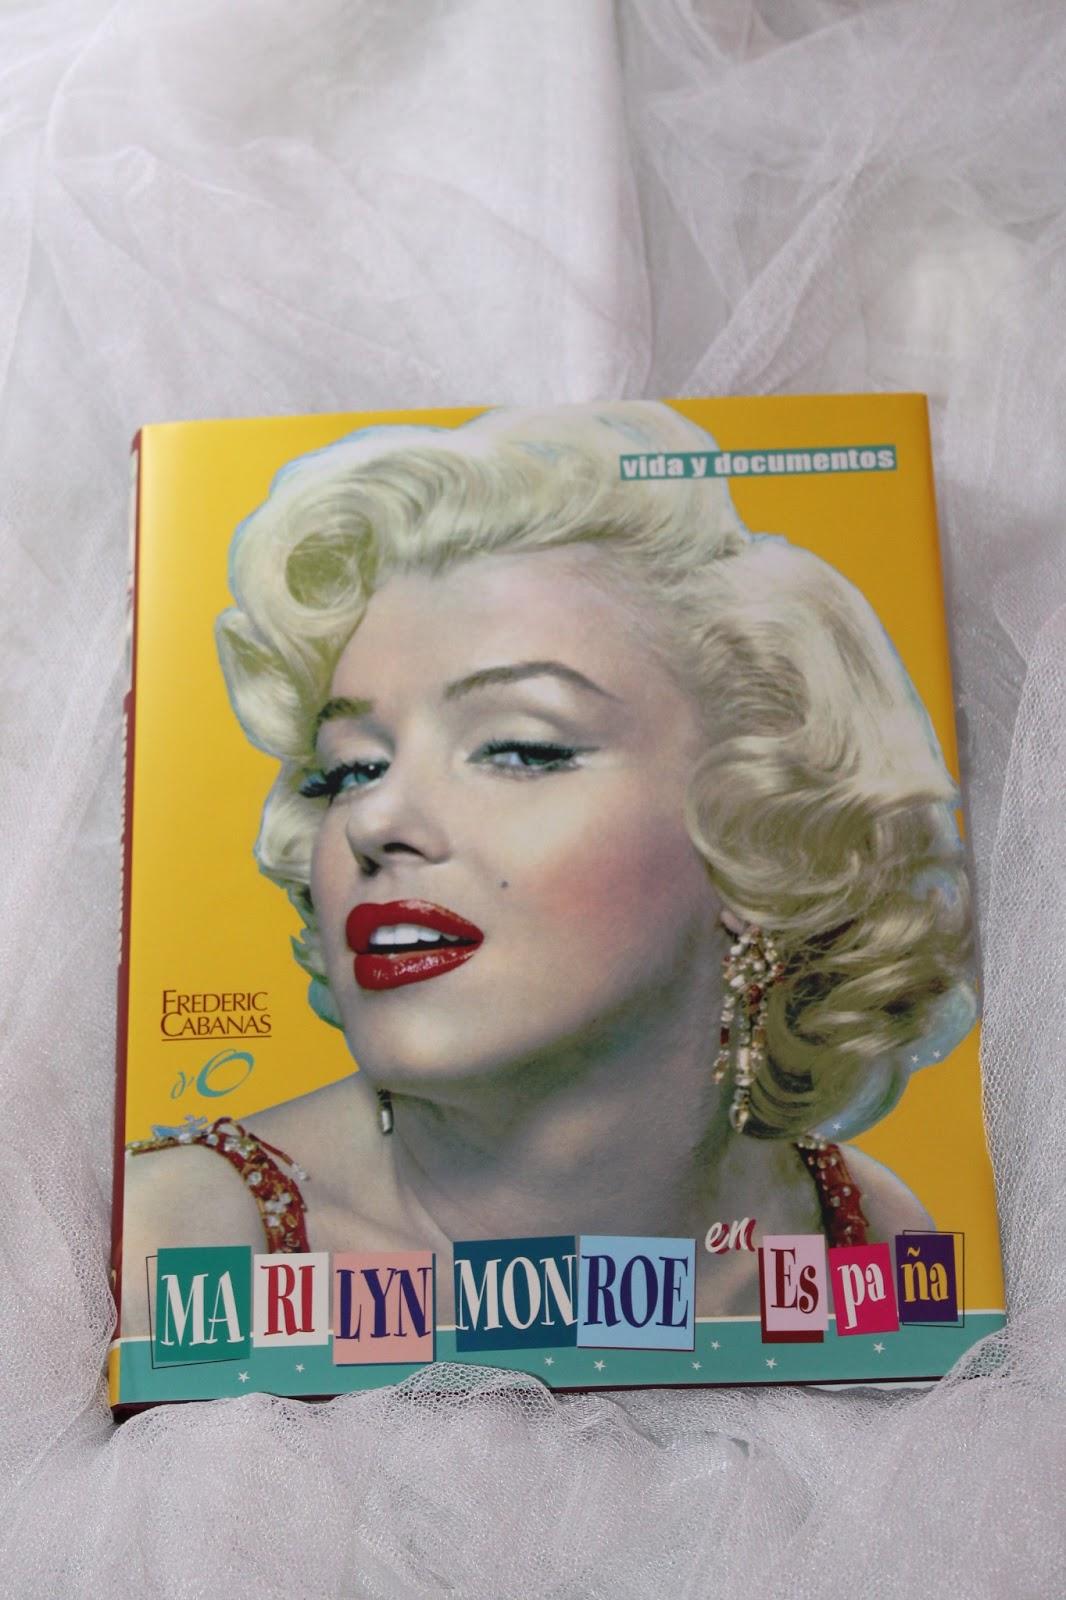 Mis libros sobre Marilyn: Marilyn Monroe en España - Frederic Cabanas